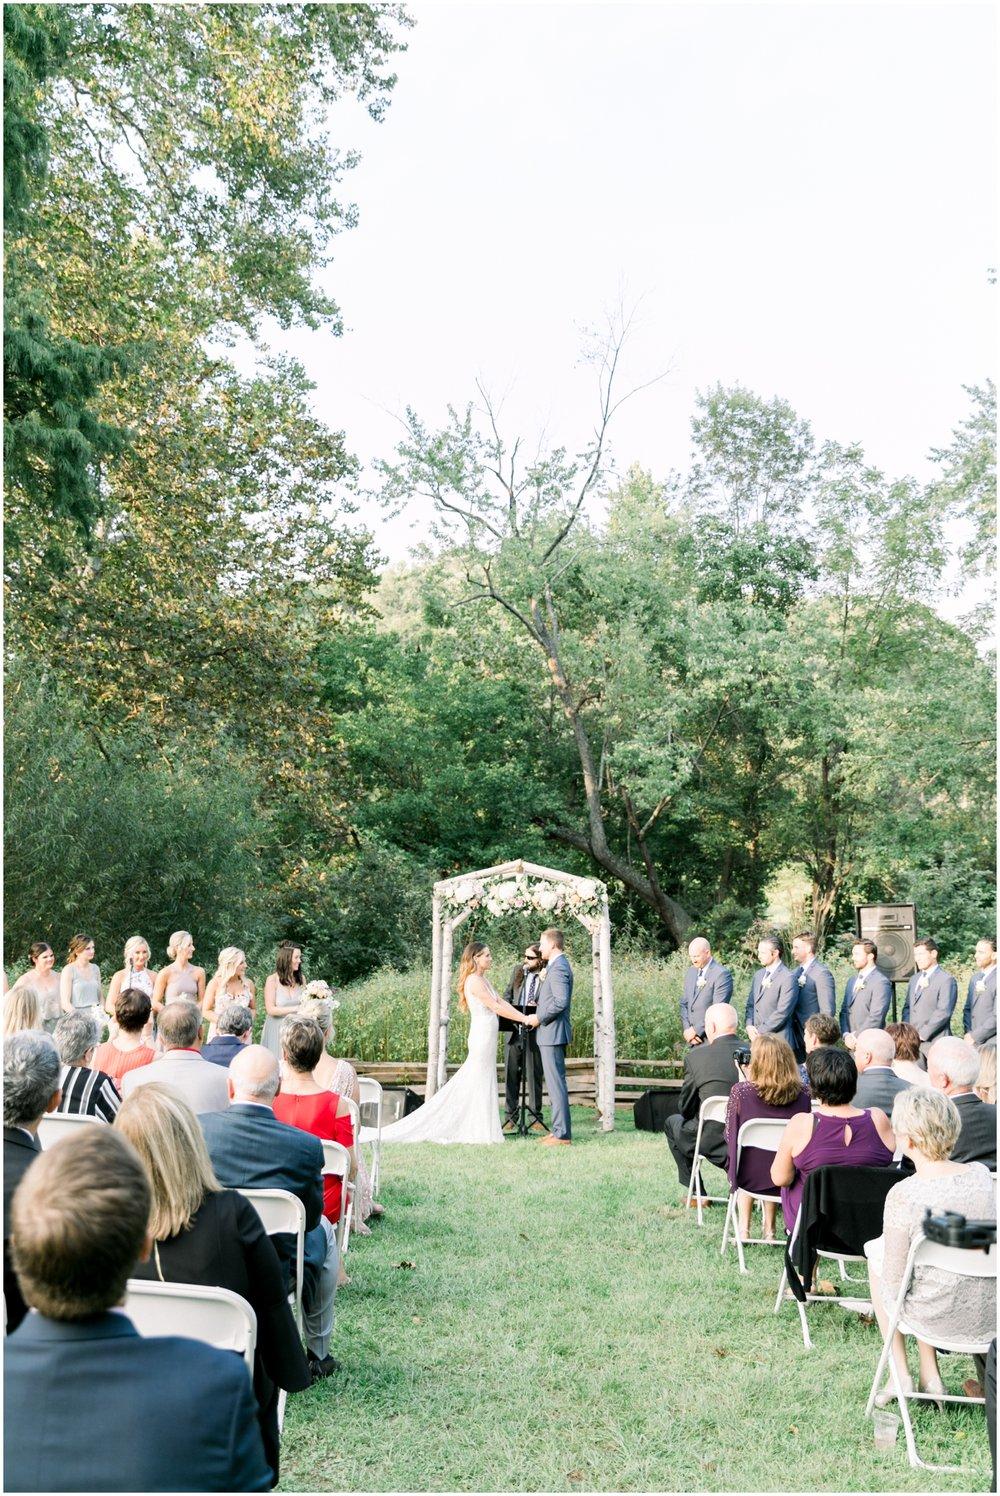 Summer Wedding at Philander Chase Knox Estate in Malvern, PA - Krista Brackin Photography_0117.jpg